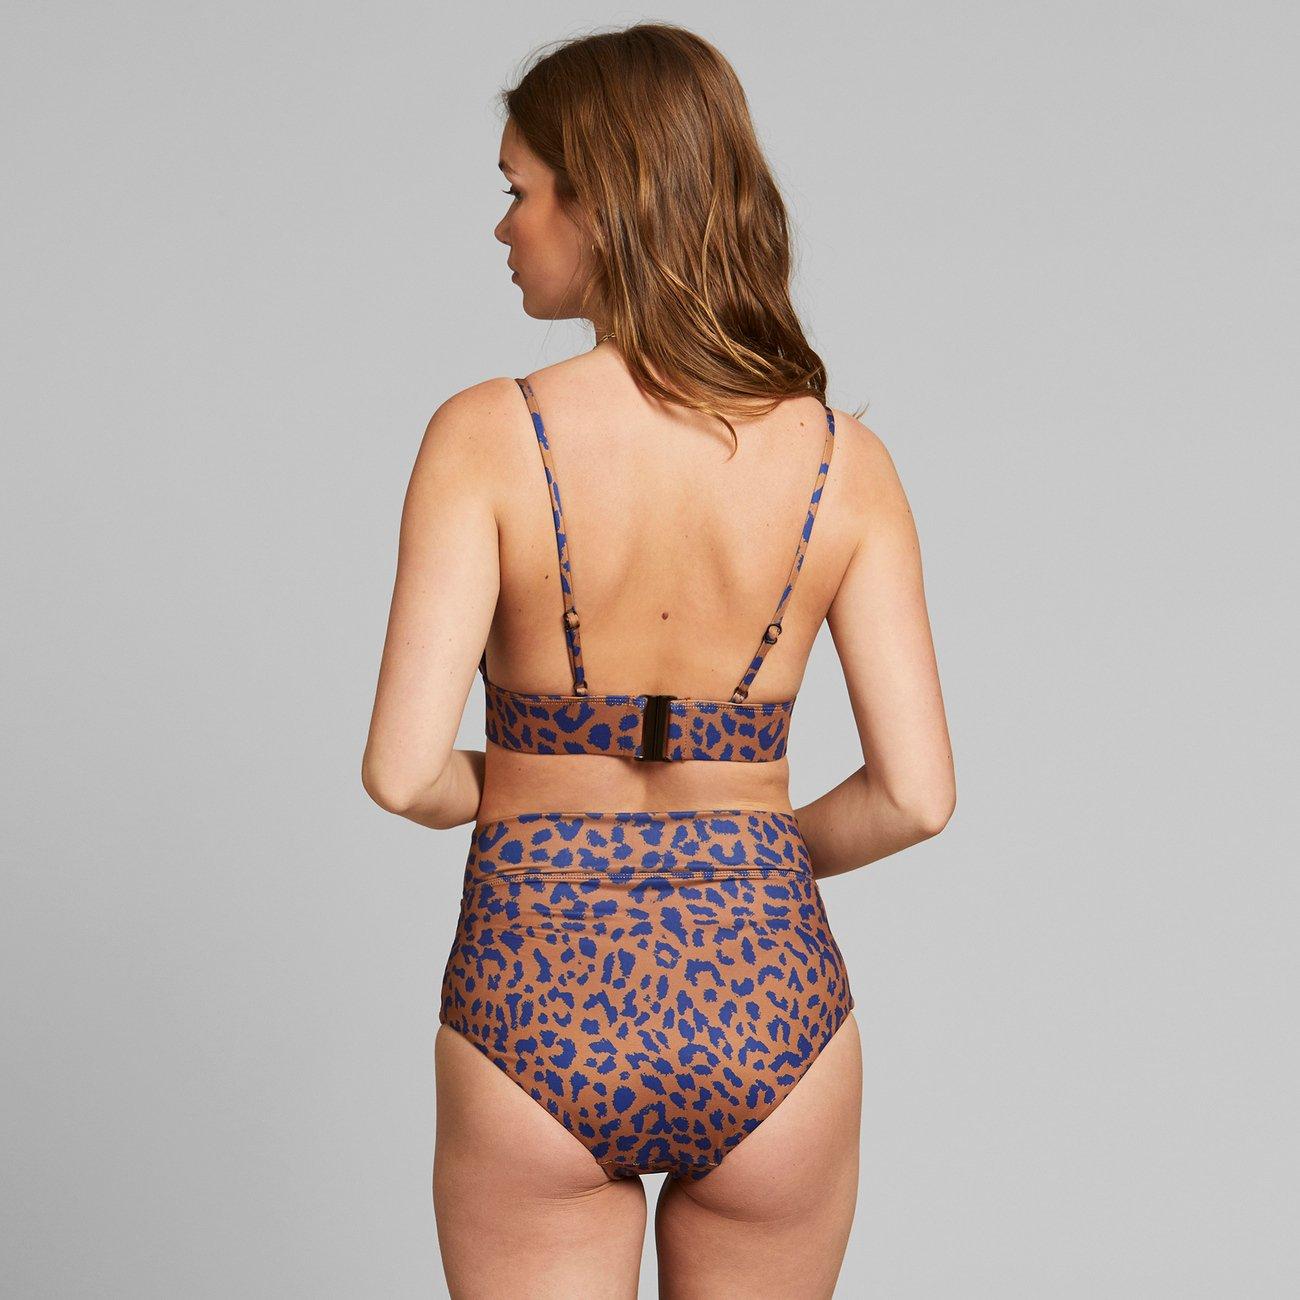 Dedicated - Bikini Pants Slite Leopard